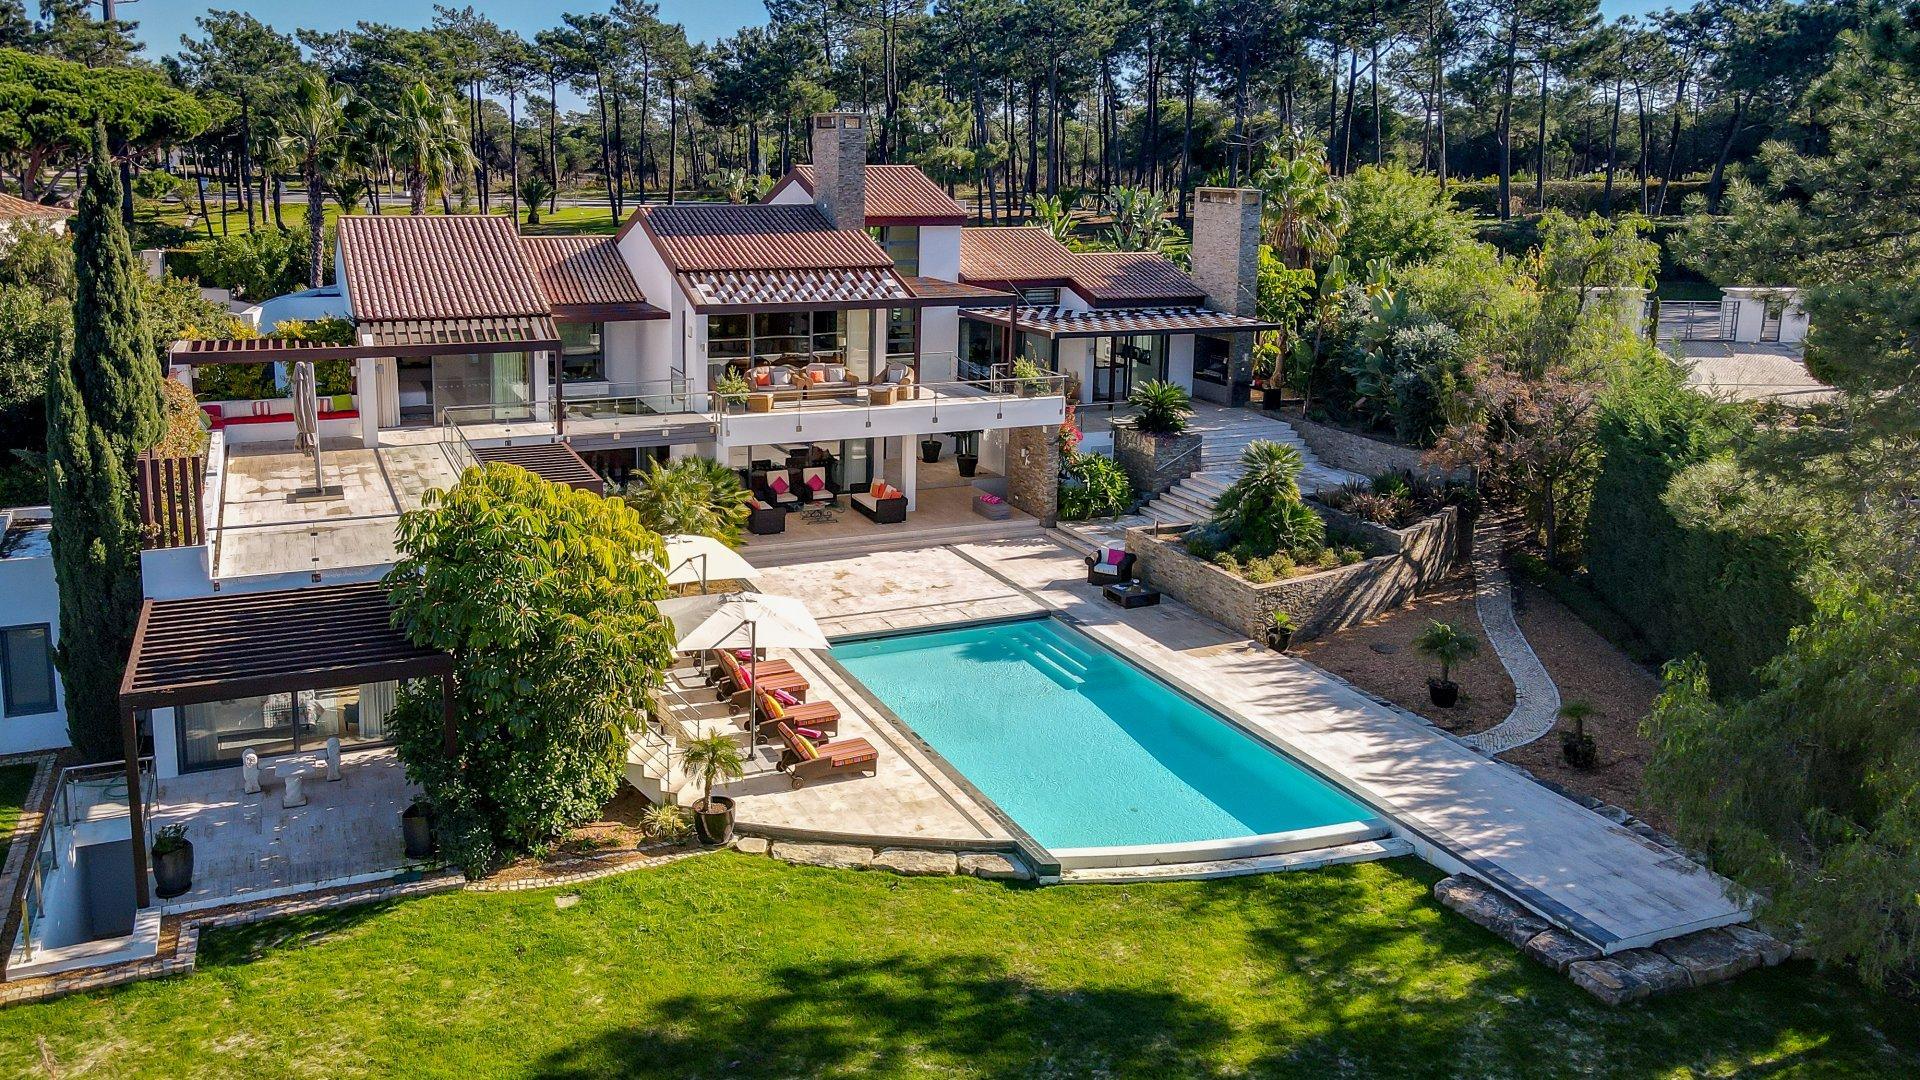 Villa Dolce Vita - Quinta do Lago, Algarve - Villa_Dolce_Vita_Exterior_3.jpg